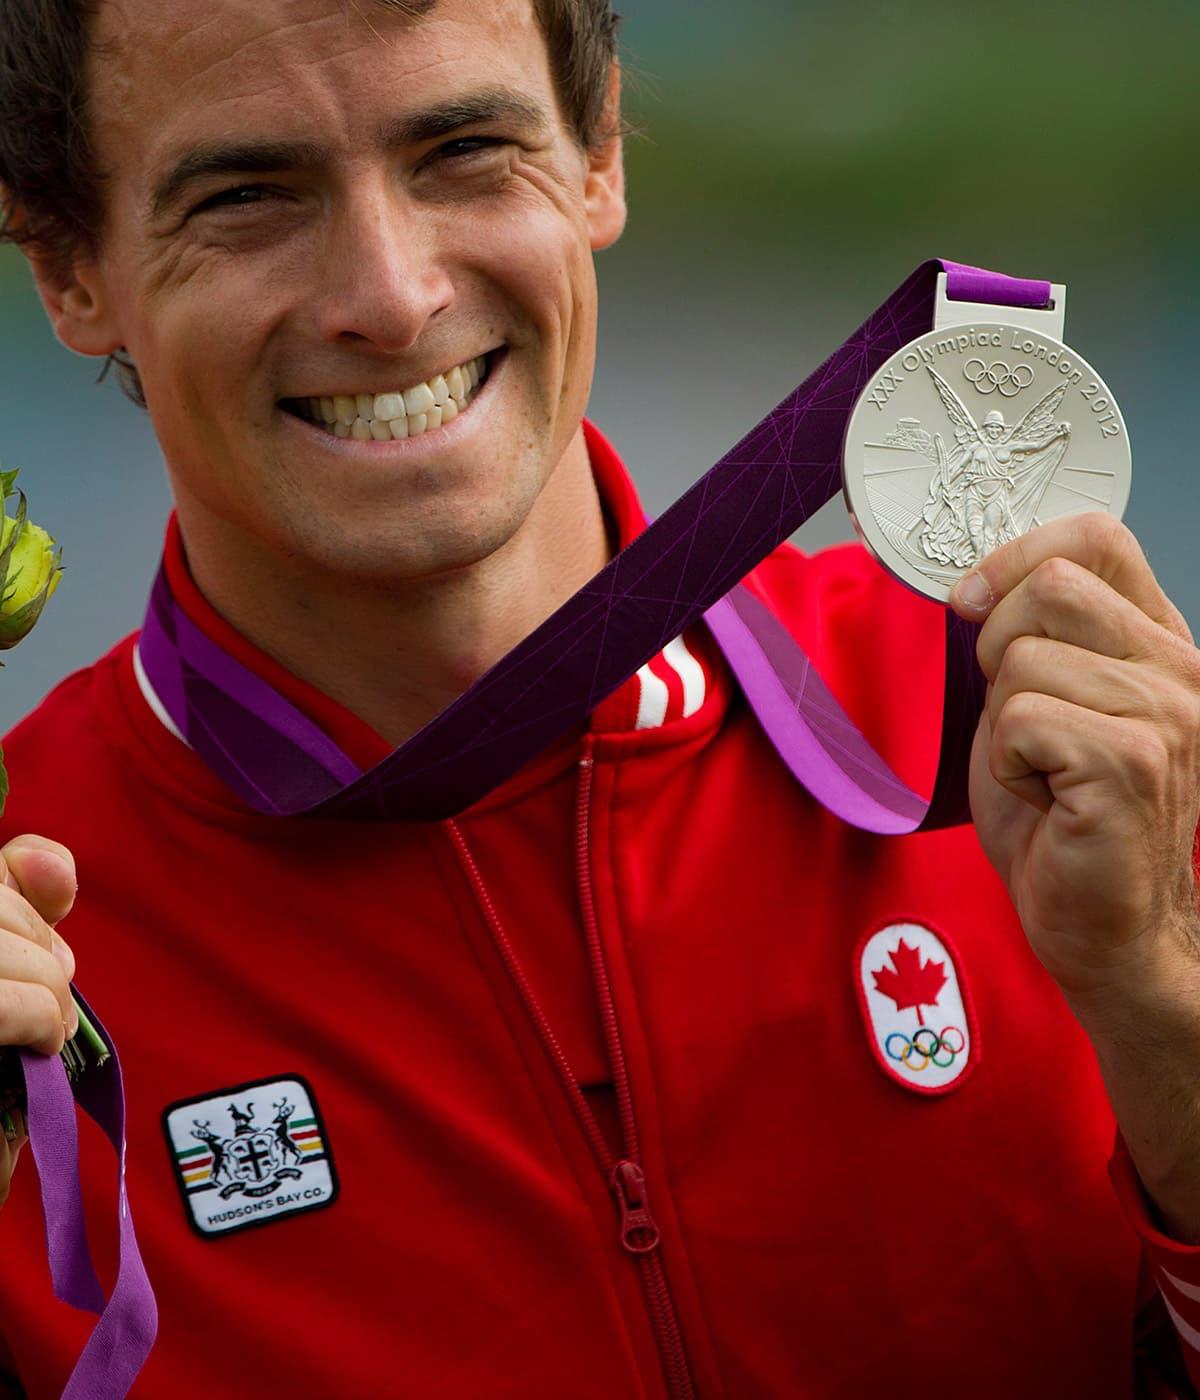 Adam van Koeverden pleads with Canada to embrace the Games